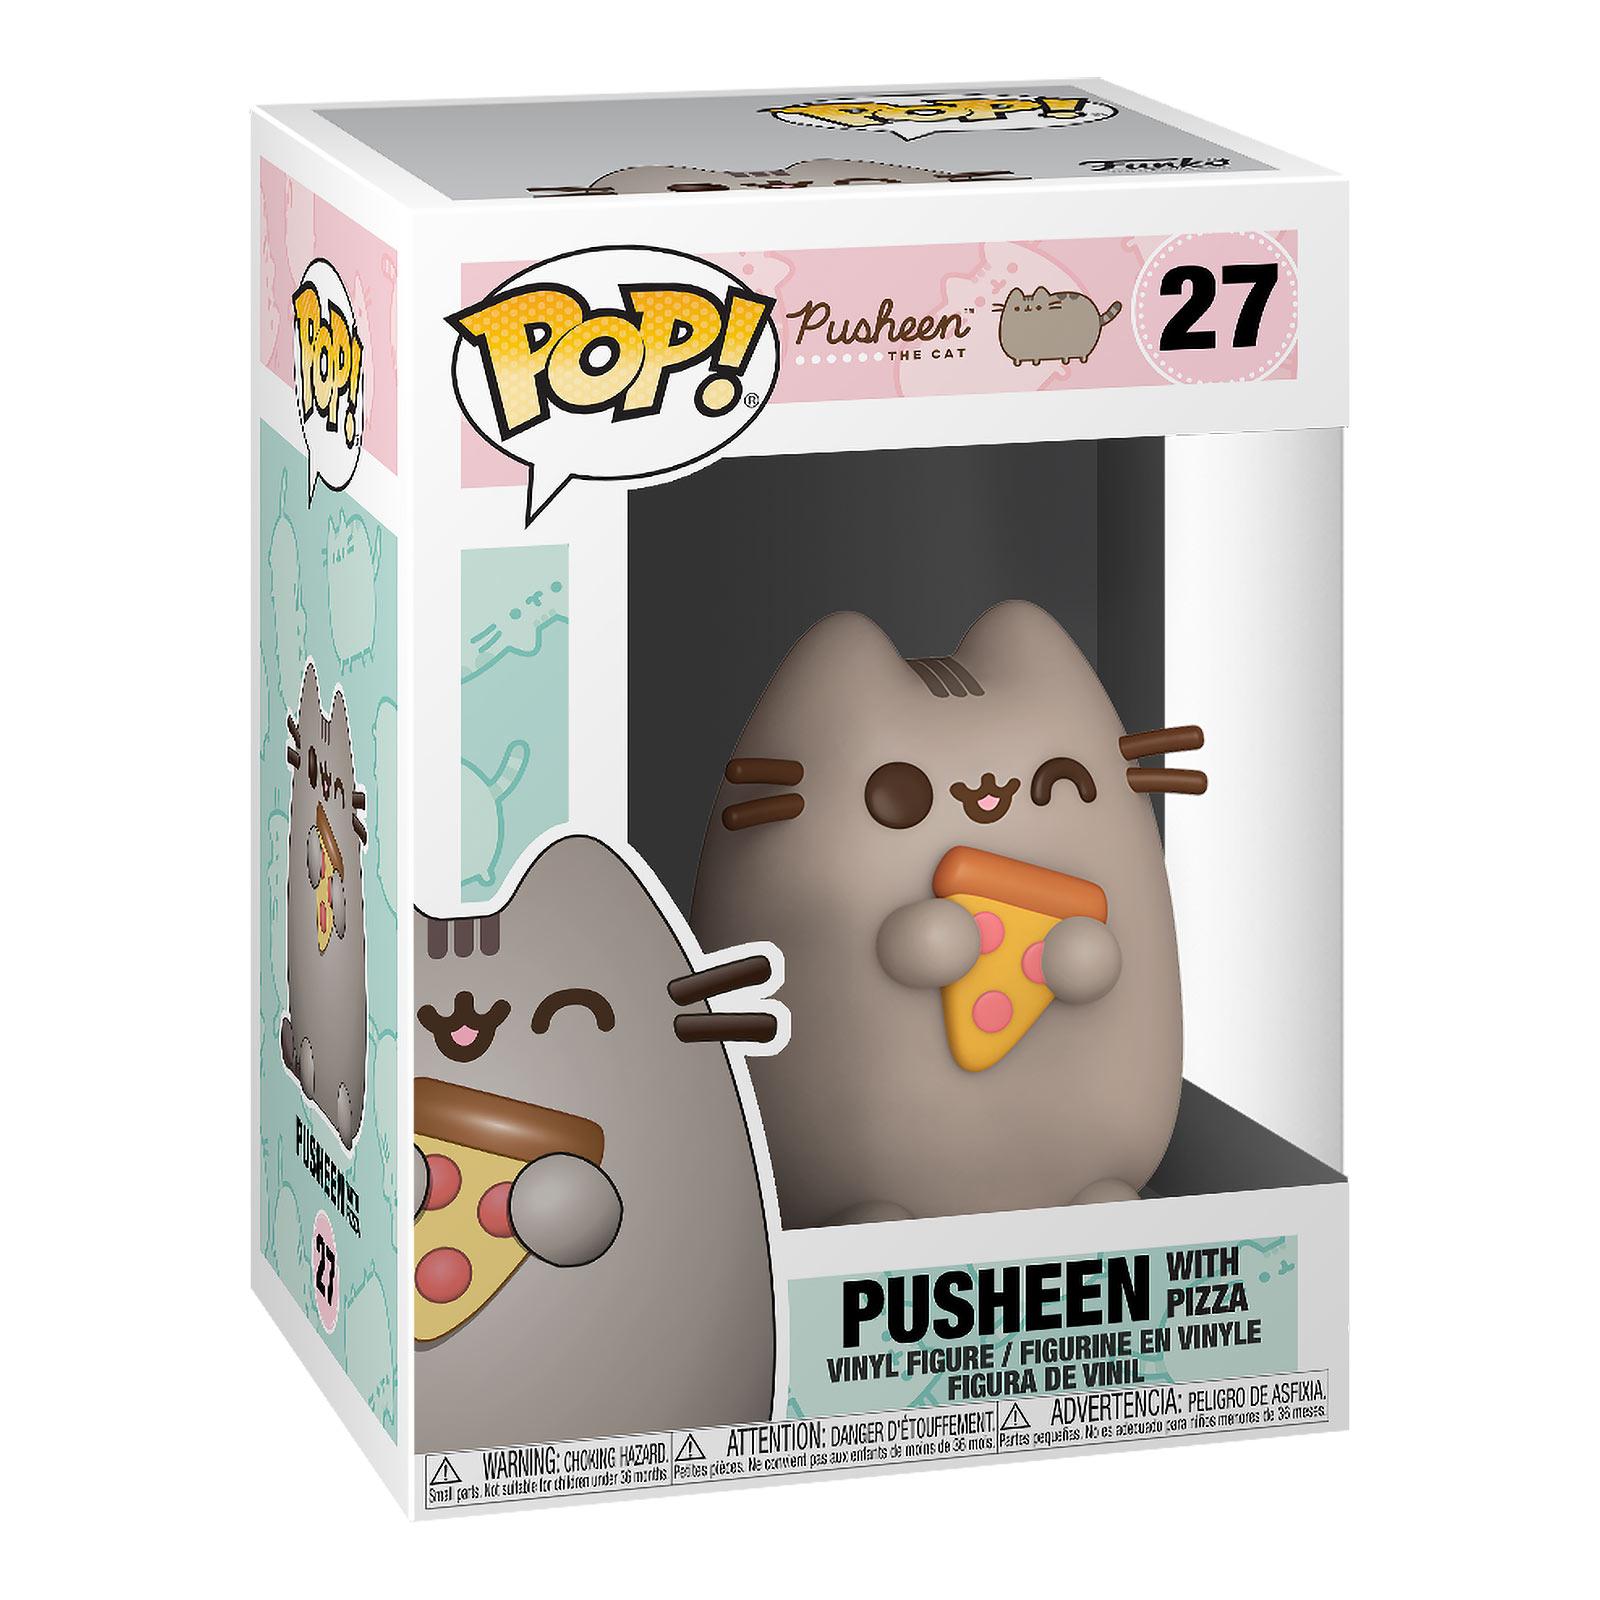 Pusheen mit Pizza Funko Pop Figur